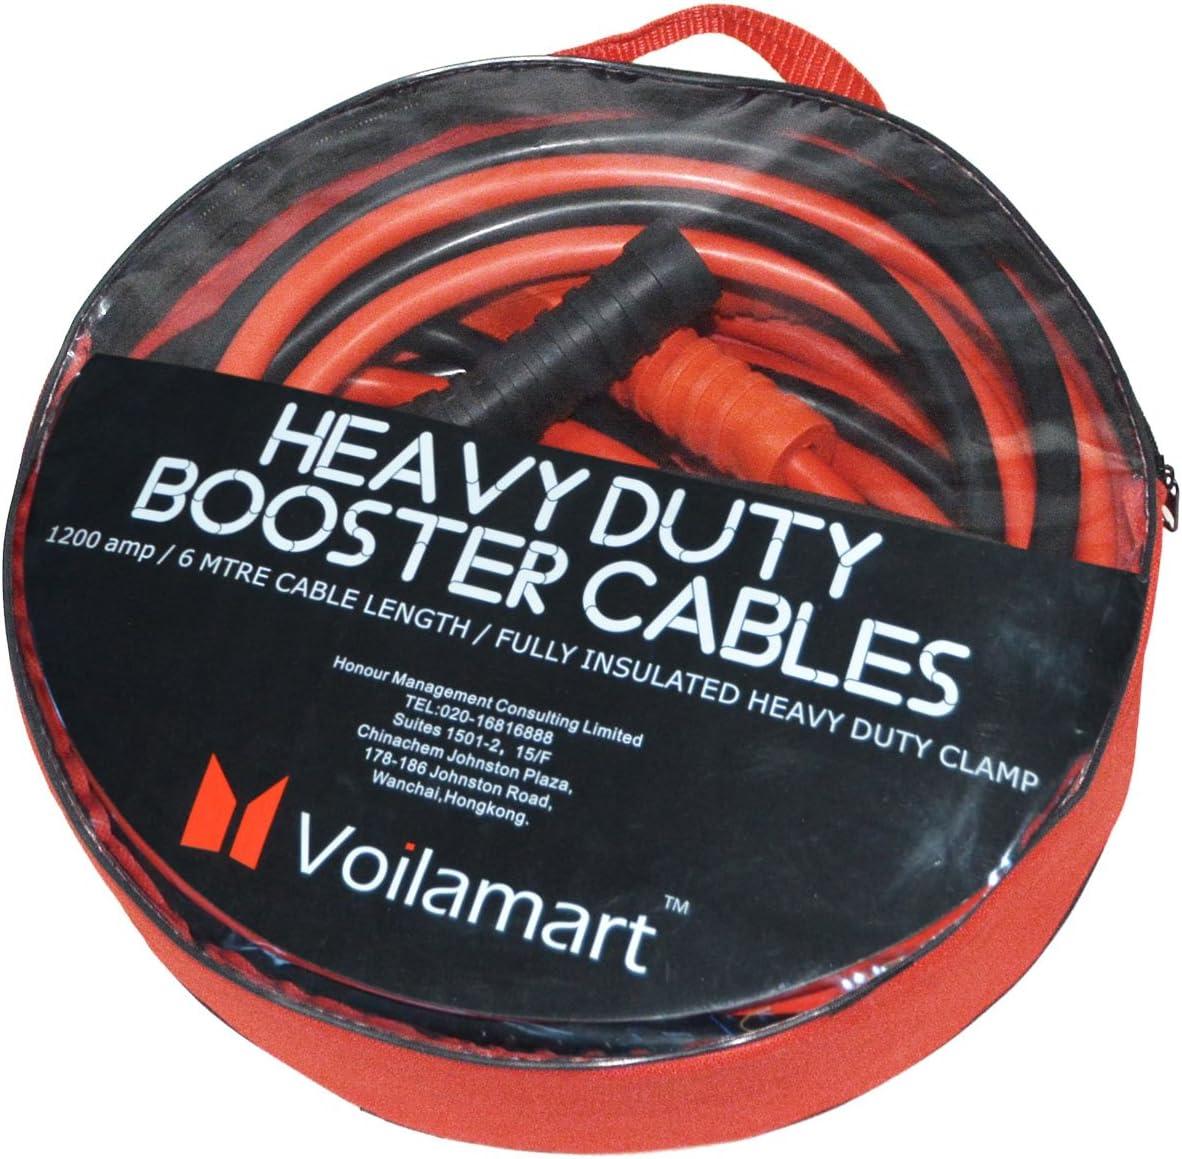 Instruction Slip Voilamart Auto Jumper Cables 1 Gauge 1200AMP 20Ft w//Carry Bag Heavy Duty for Car Van Truck Commercial Grade Automotive Booster Cables